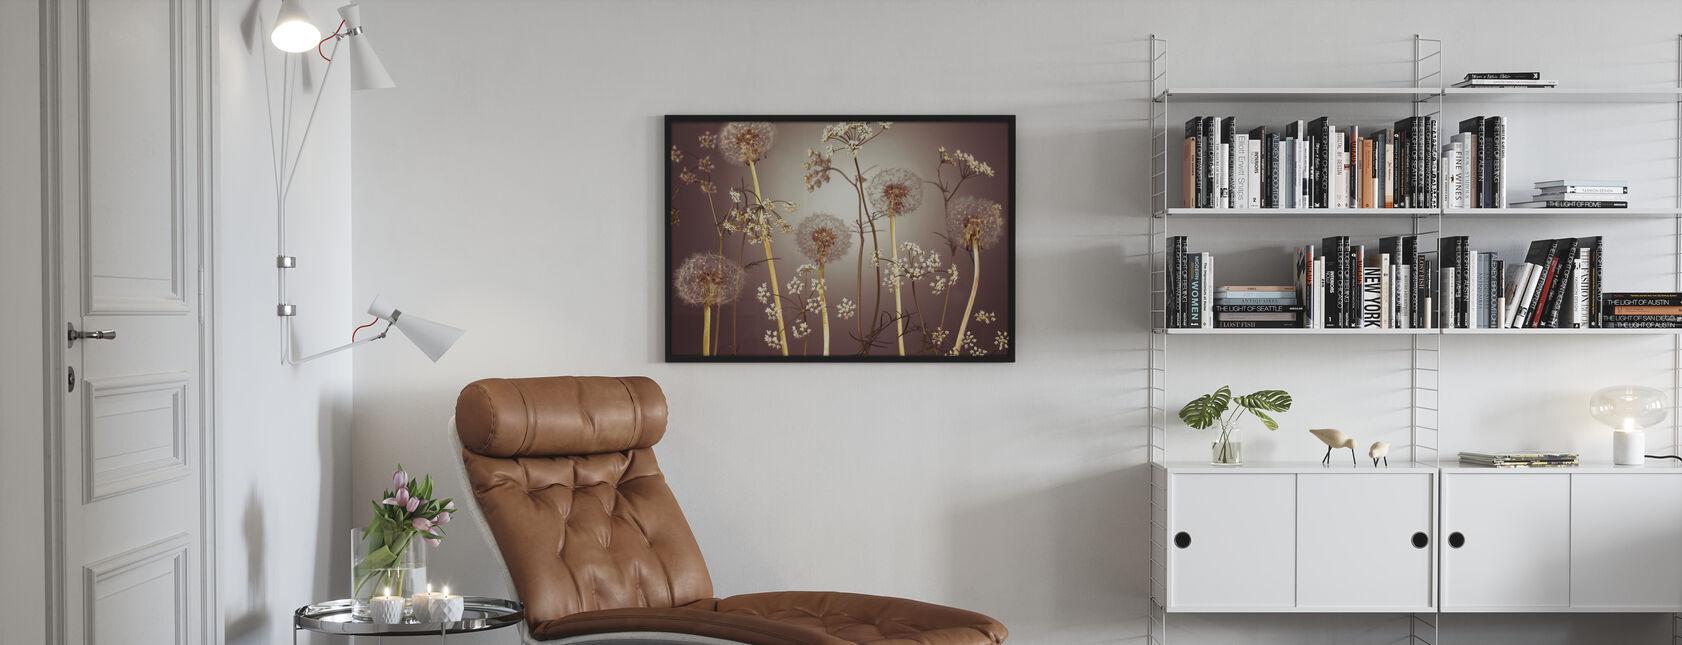 Weide Bloemen - Hazel - Ingelijste print - Woonkamer